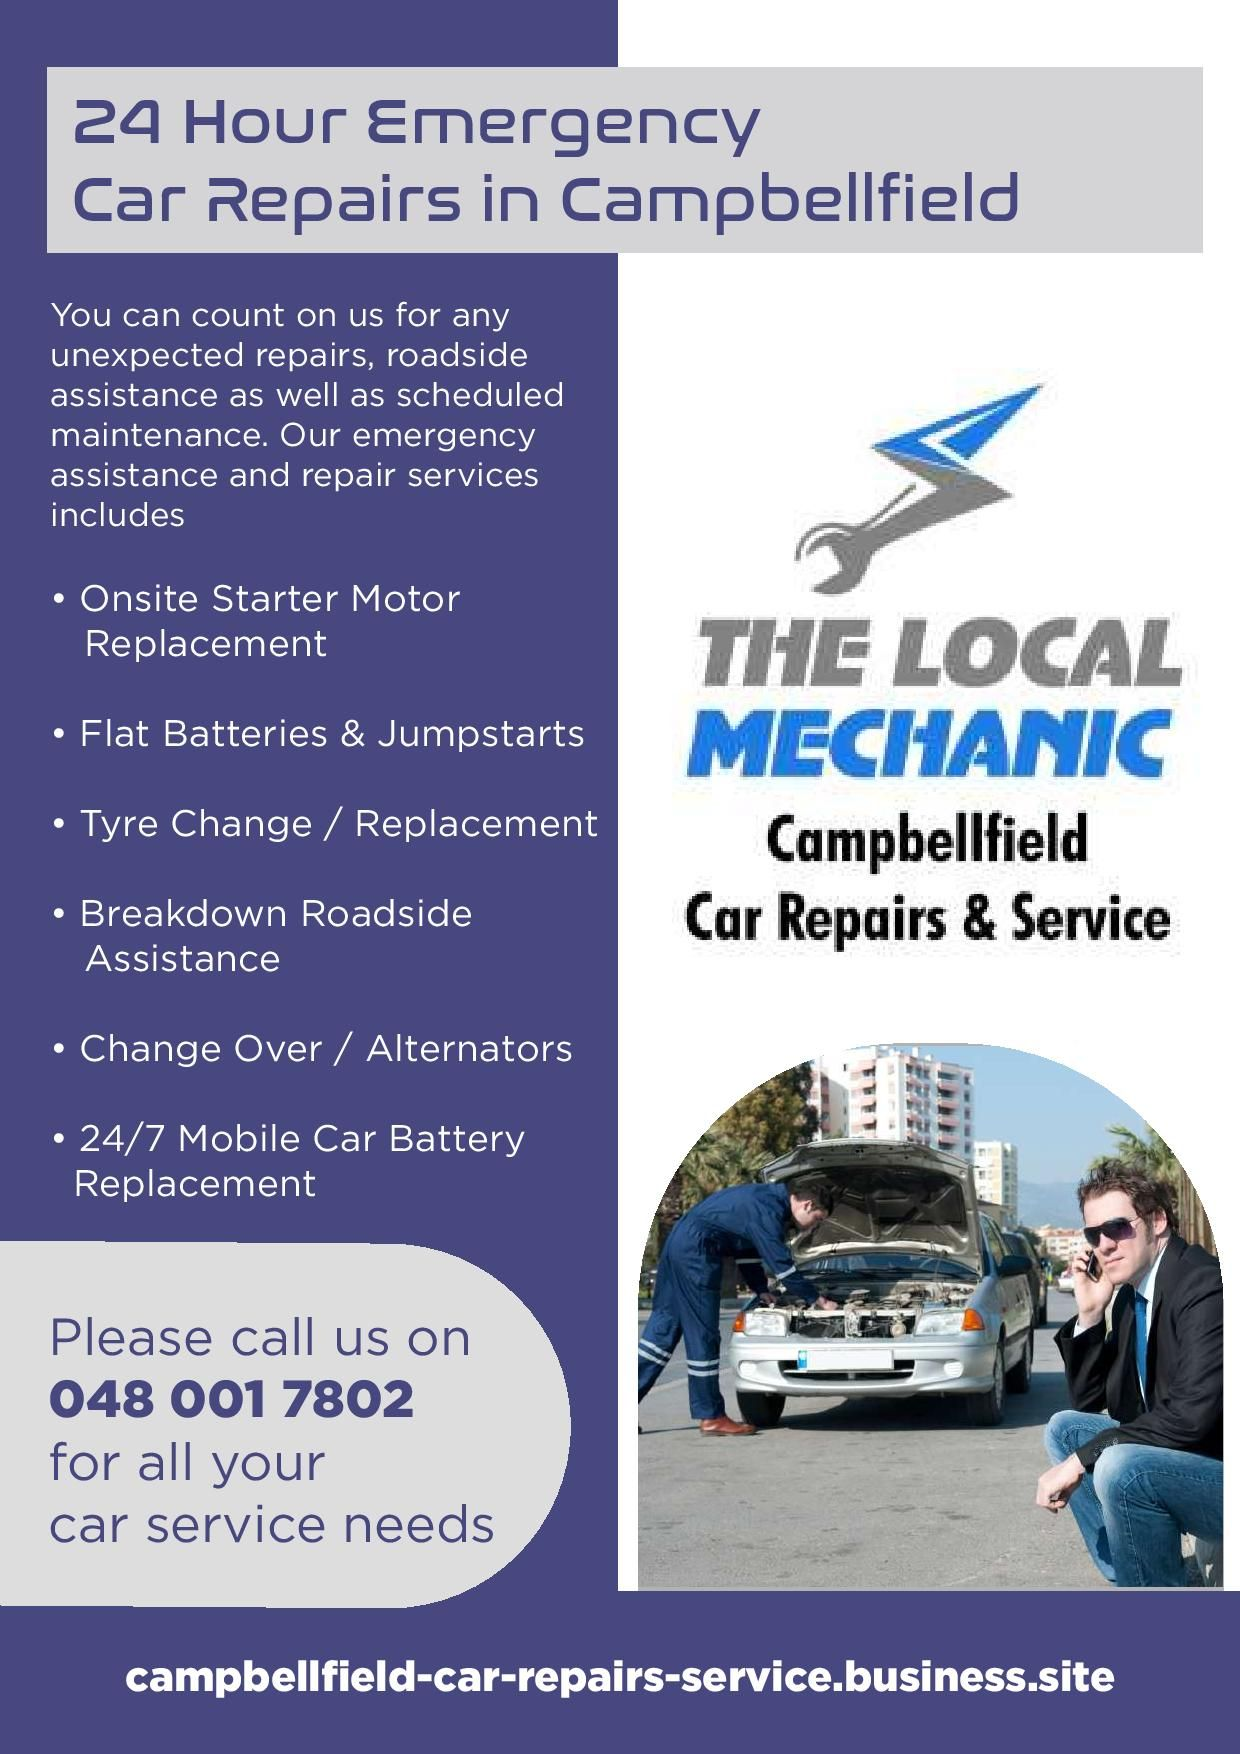 Campbellfield Car Repairs & Service | Car repair service ...